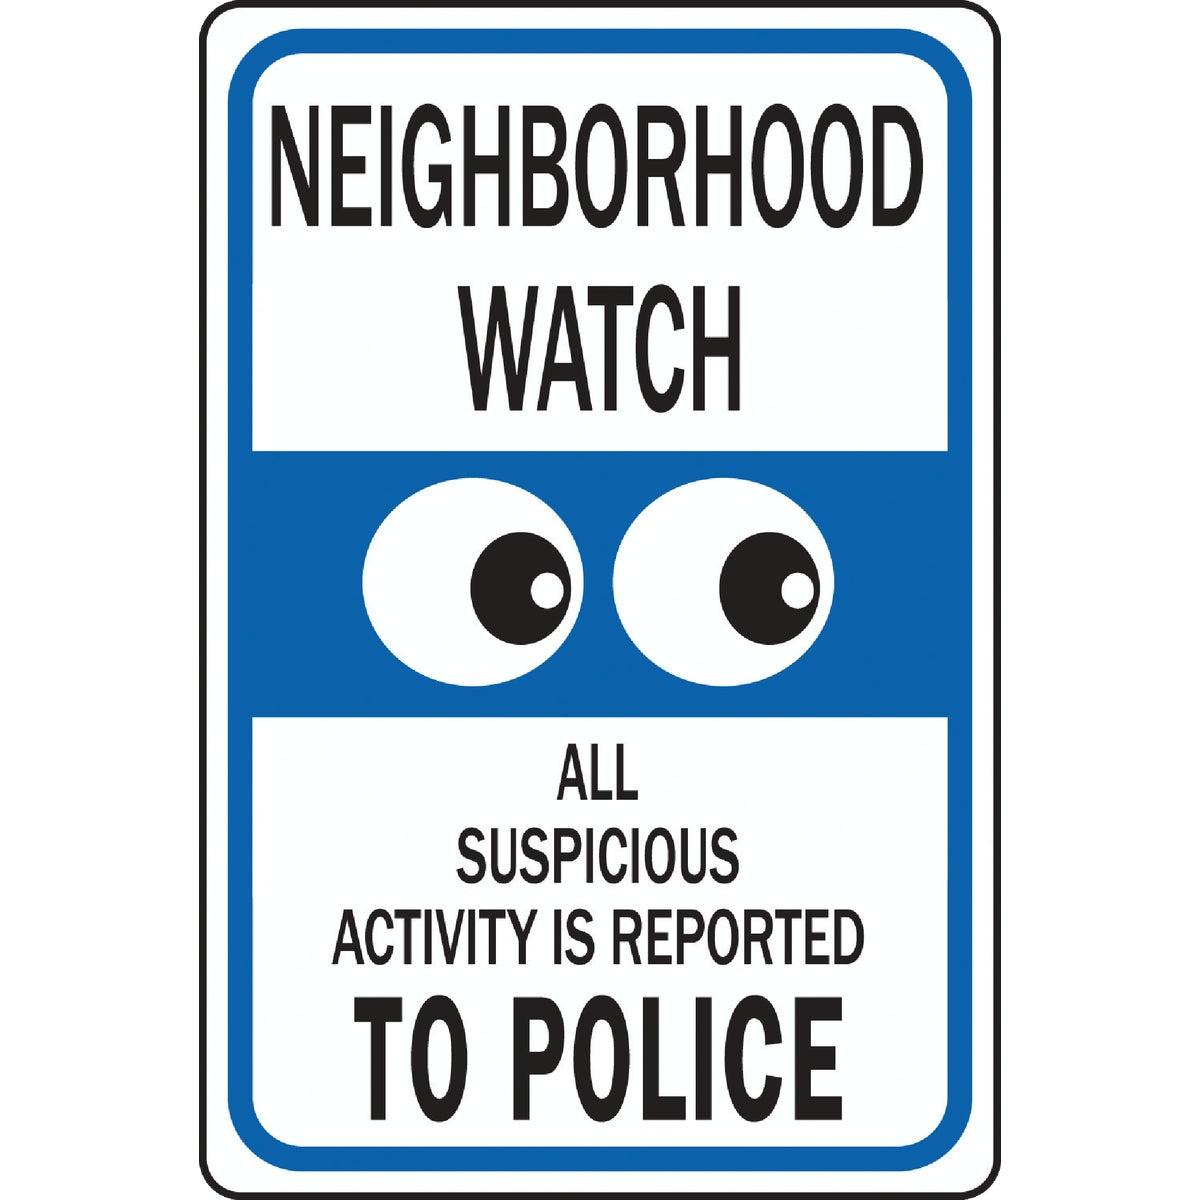 NEIGHBORHOOD WATCH SIGN - HW-28 by Hy Ko Prods Co